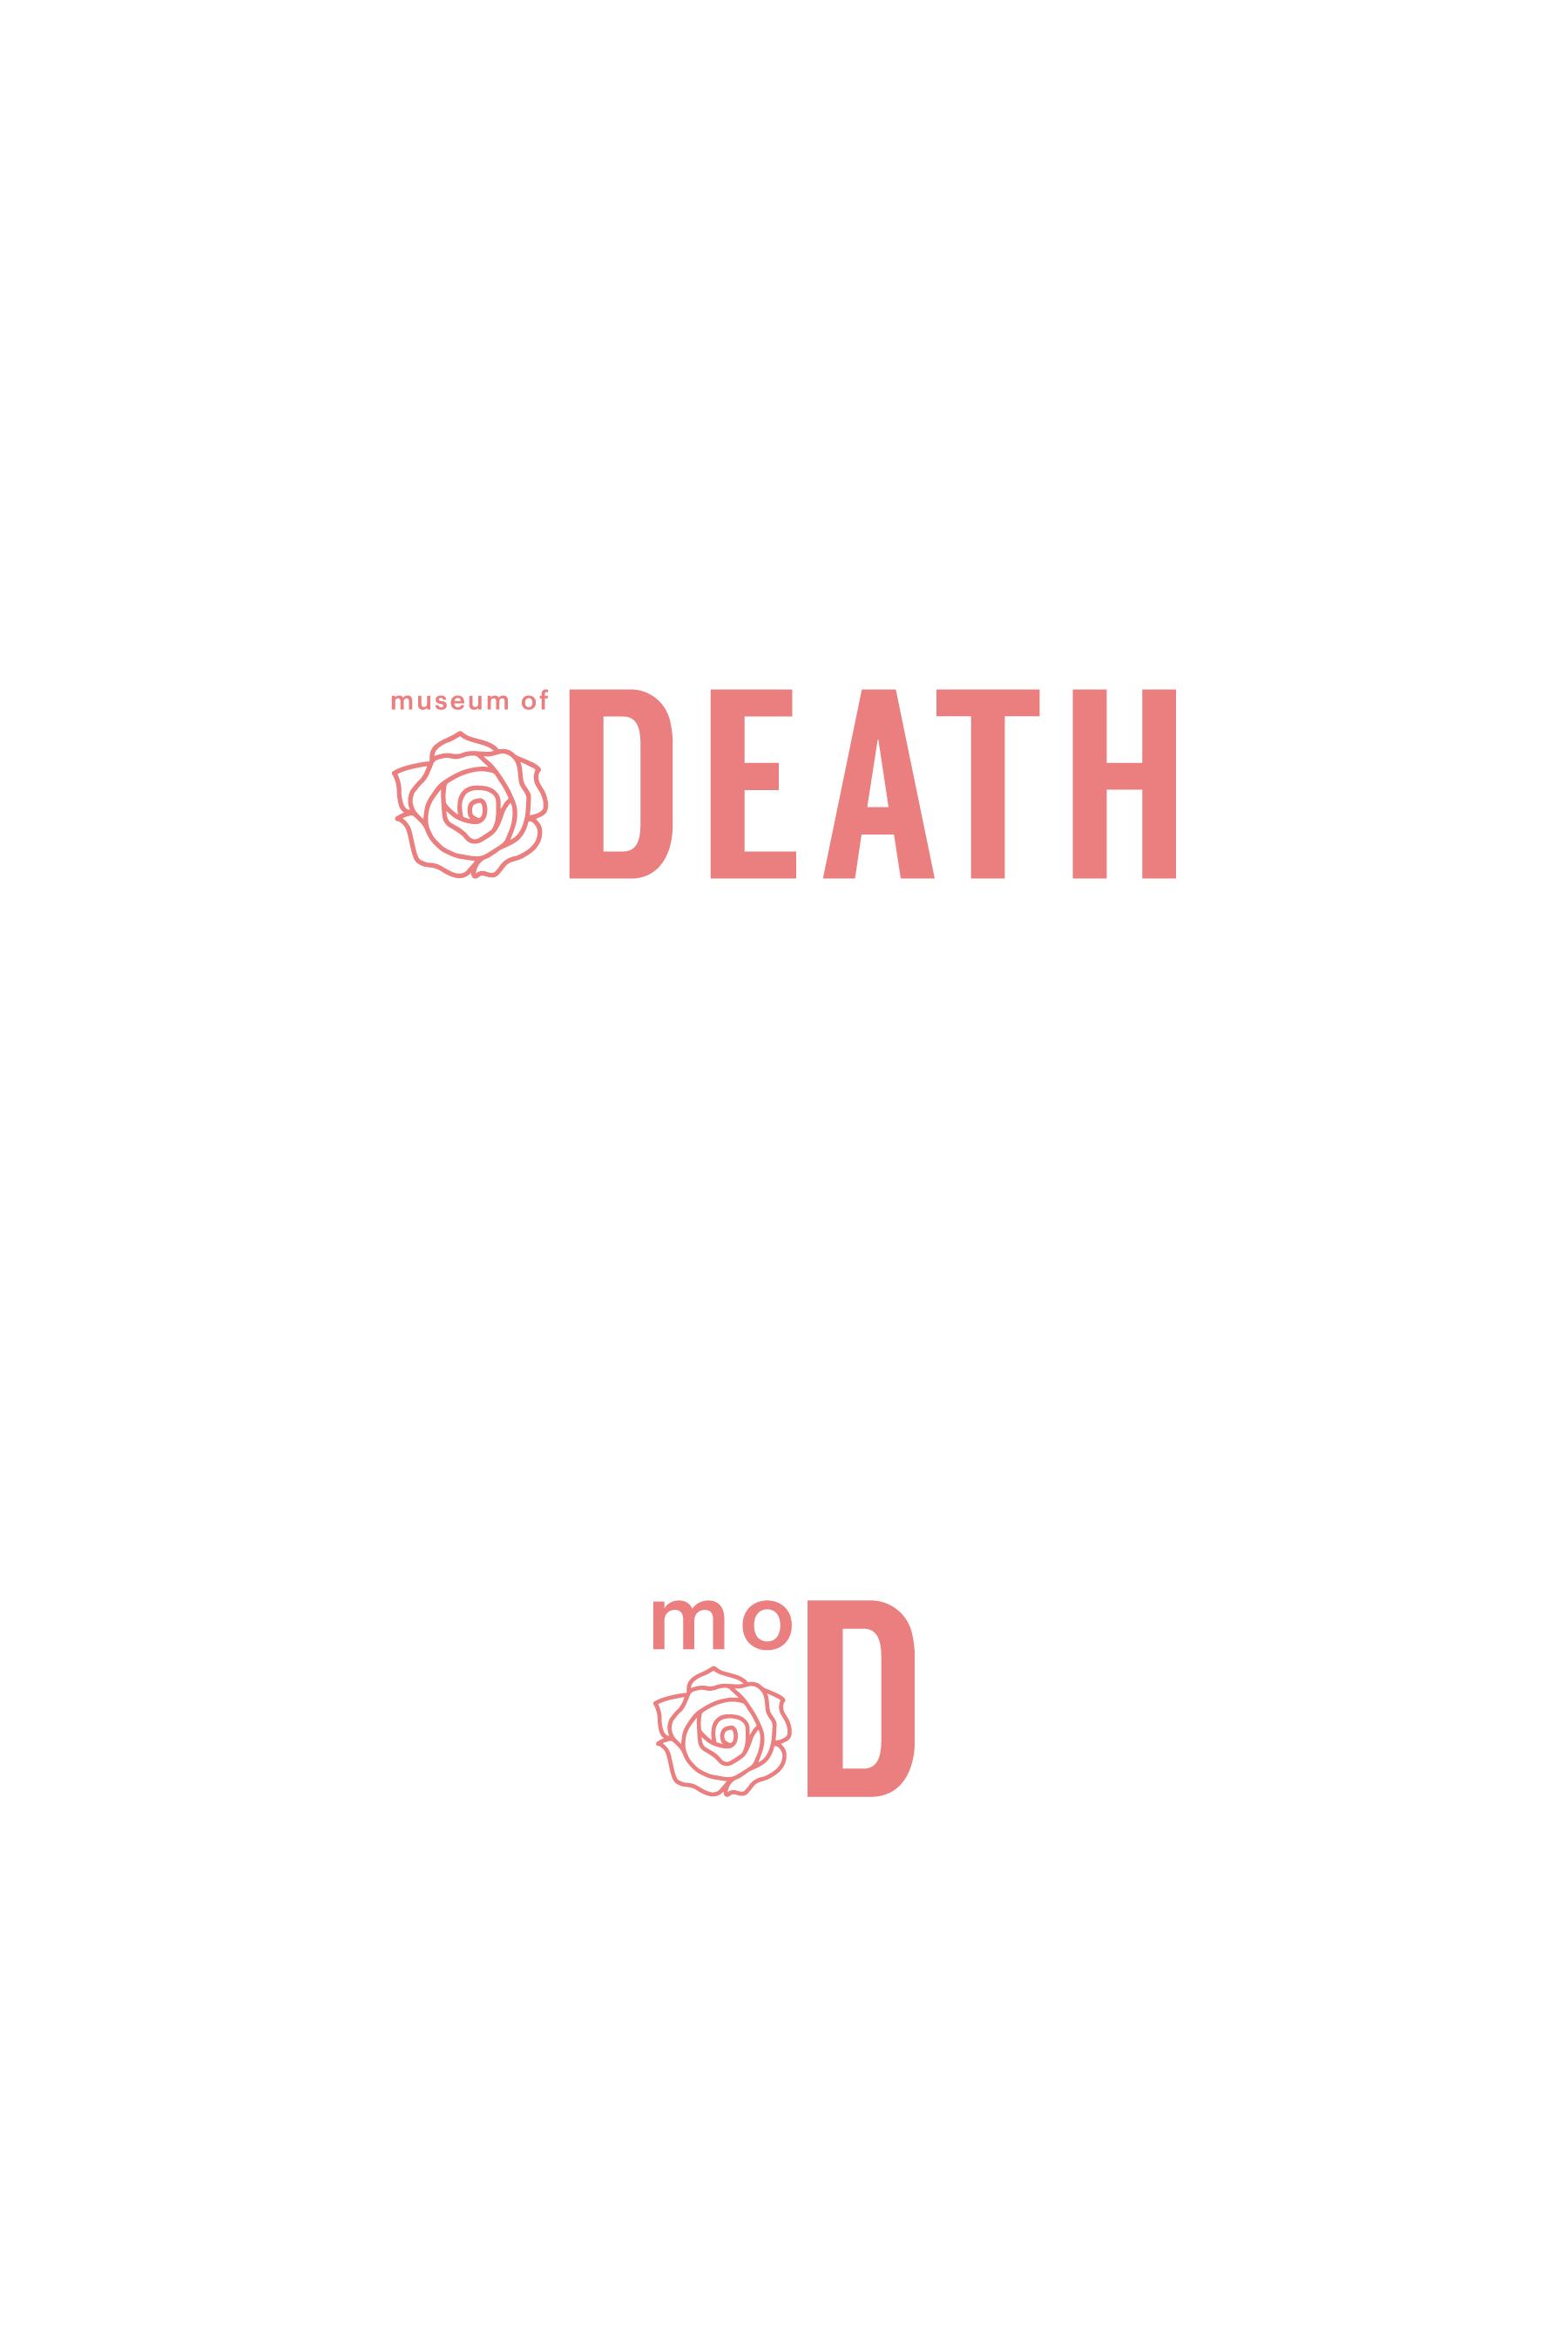 logo_format_02.png